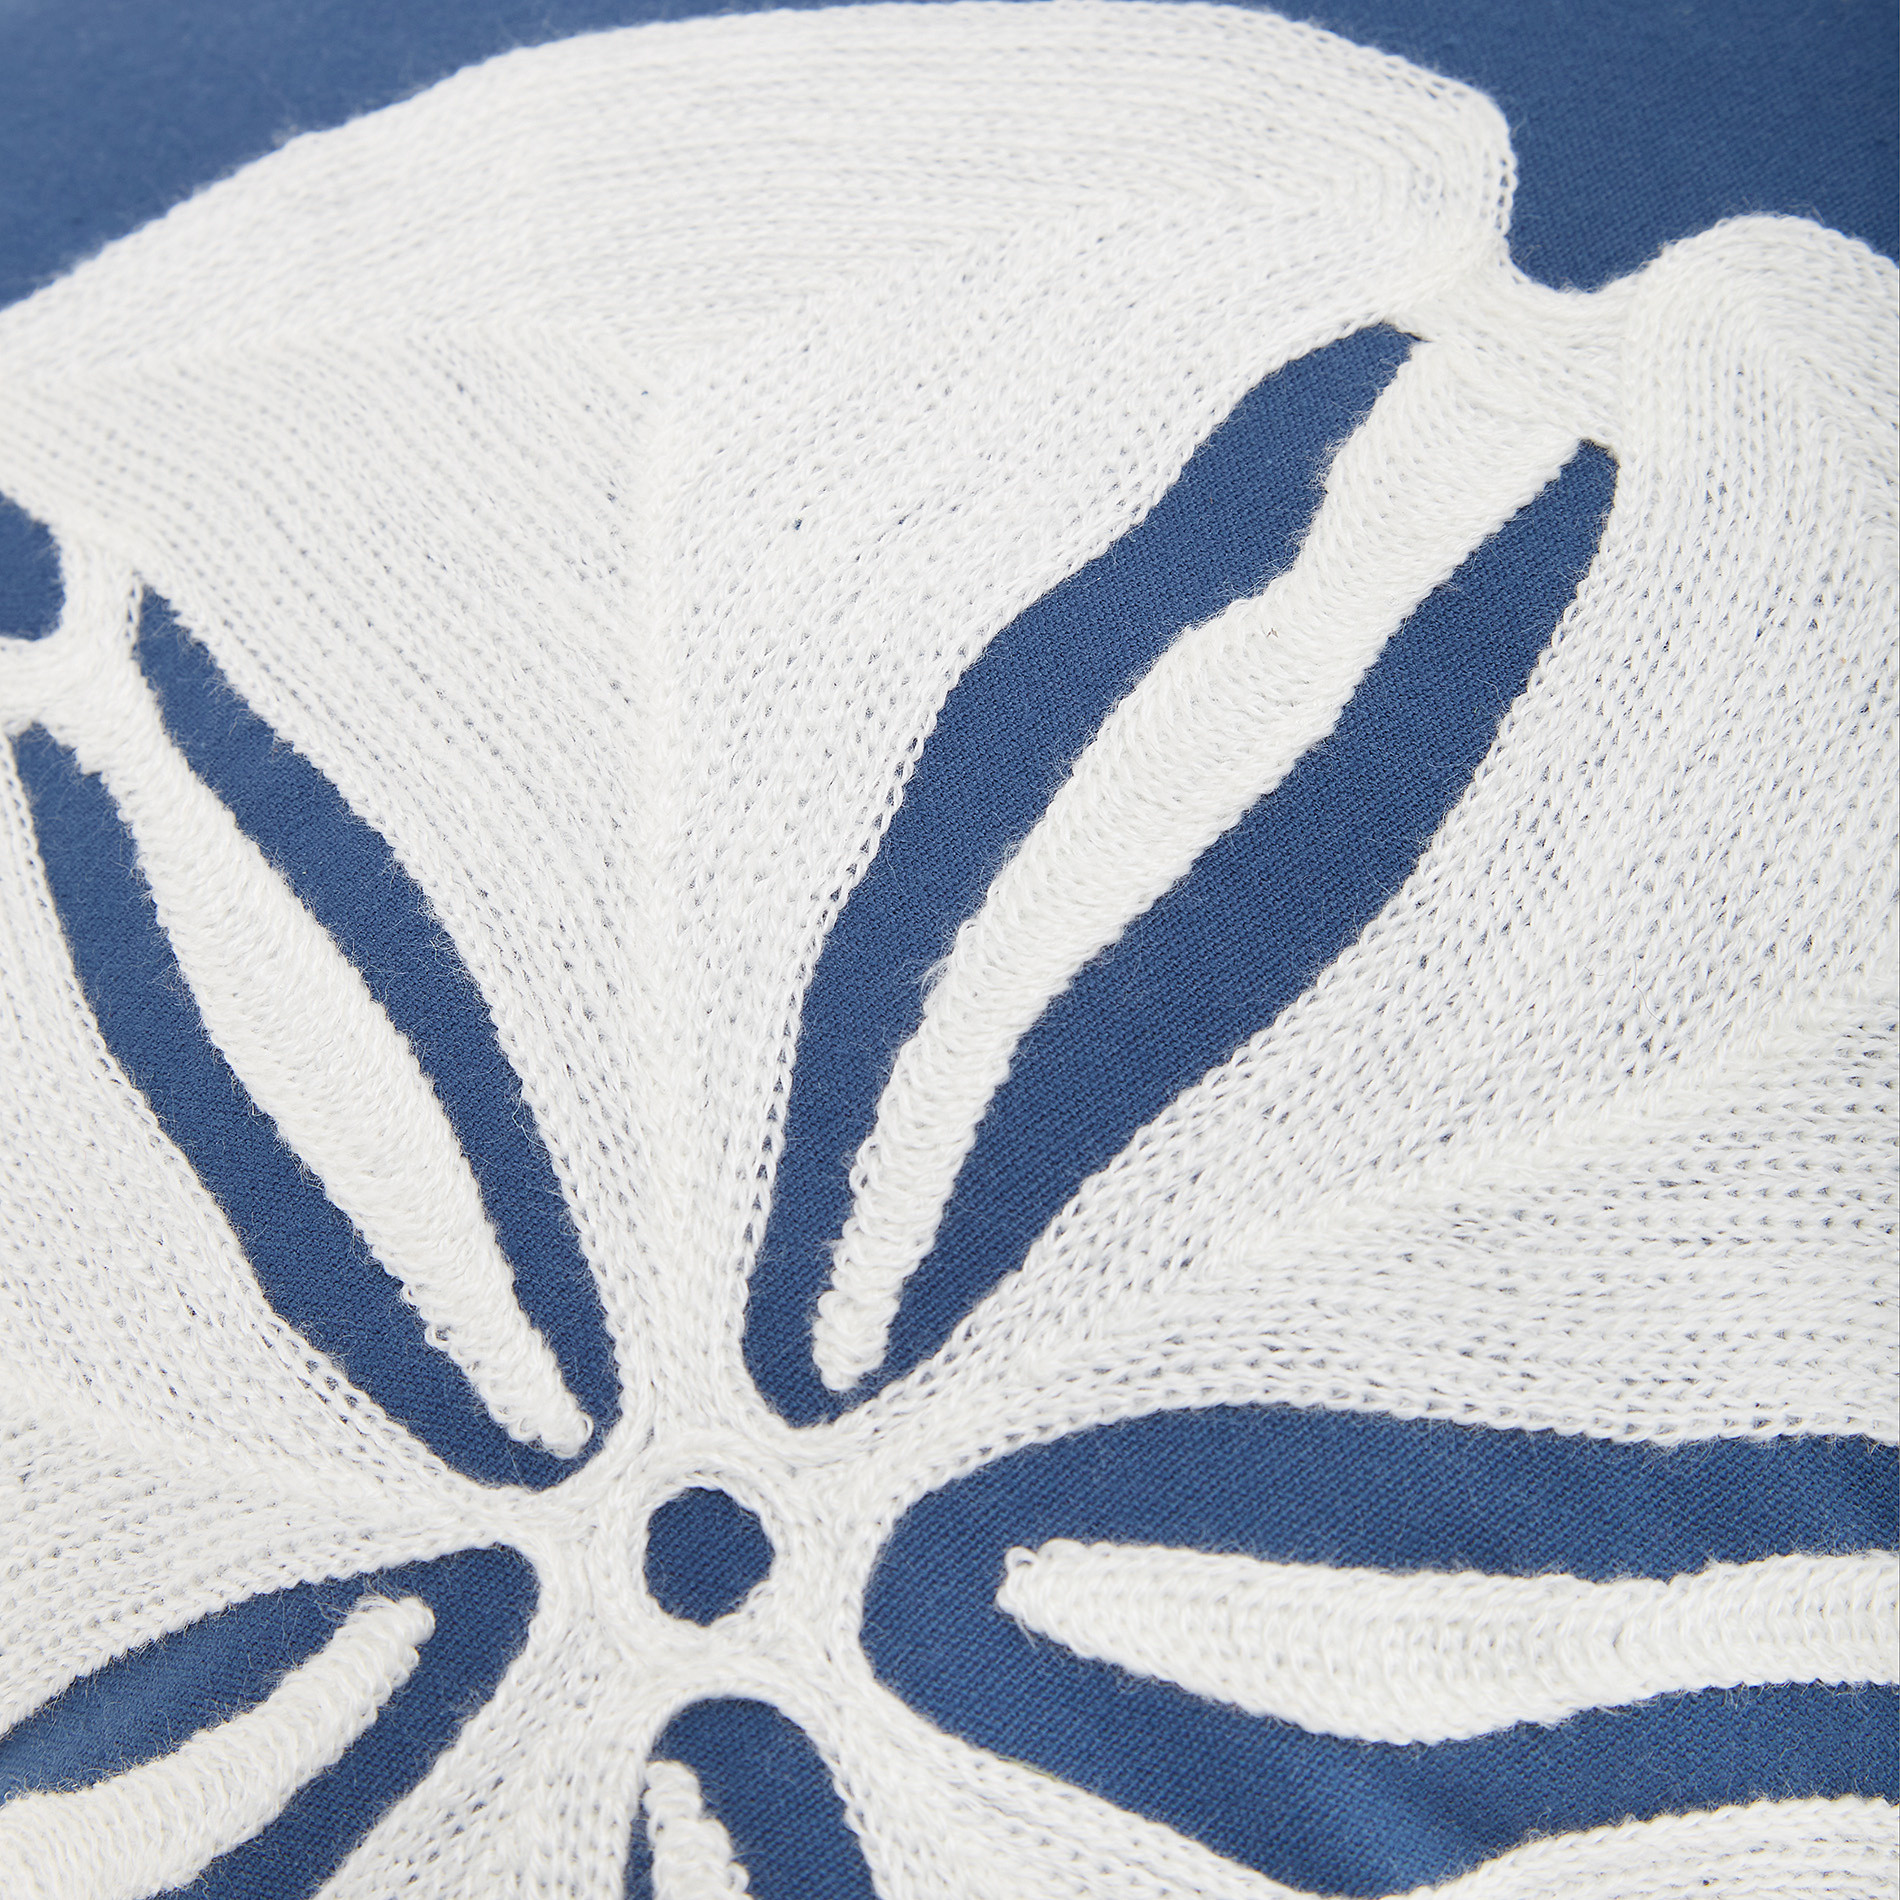 Cuscino ricamo conchiglie 45x45cm, Blu, large image number 1